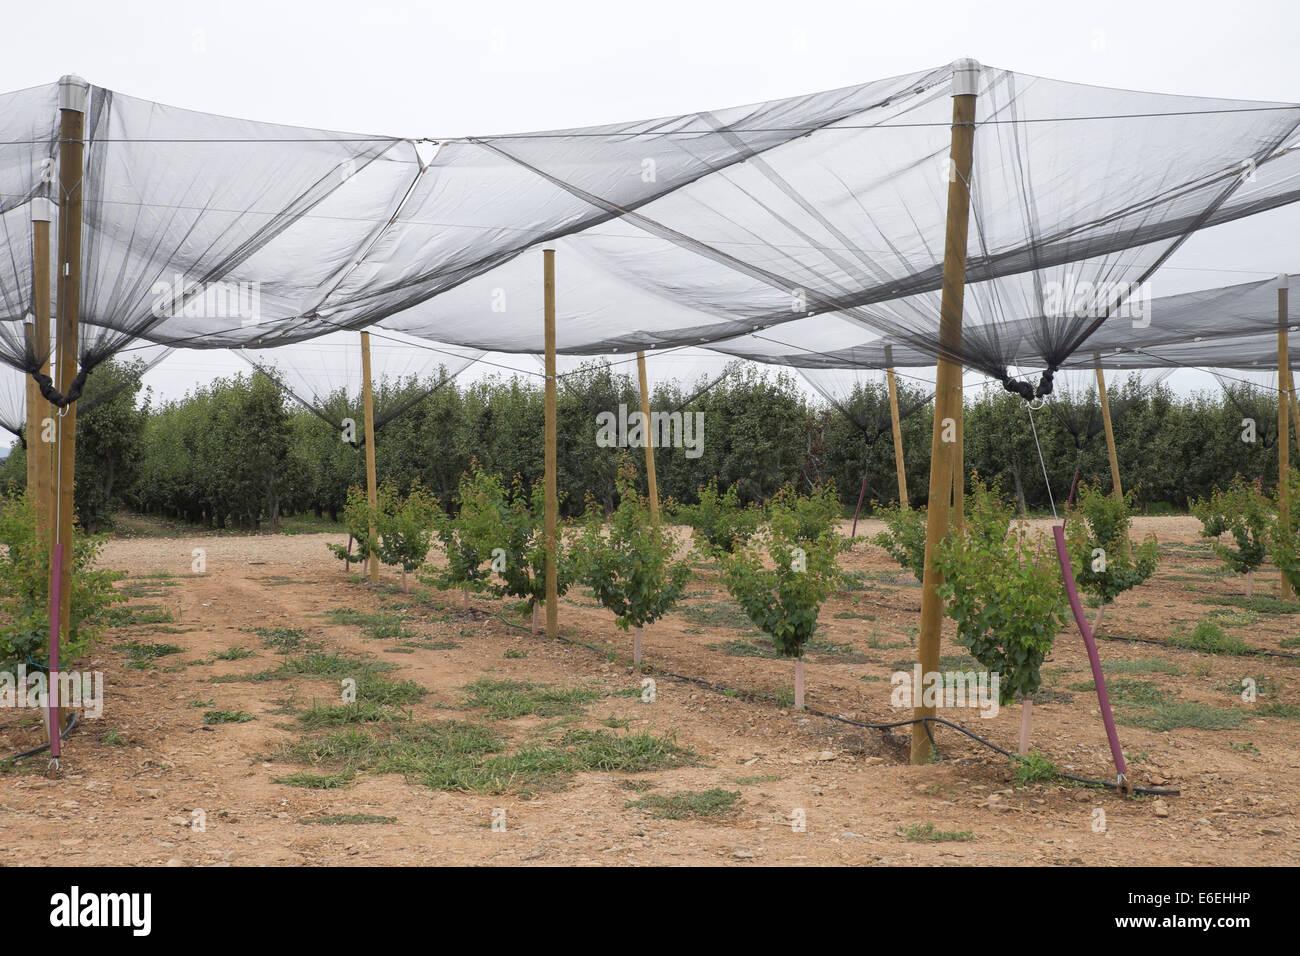 Spanish Farms during  Russian boycott food to EU - Stock Image